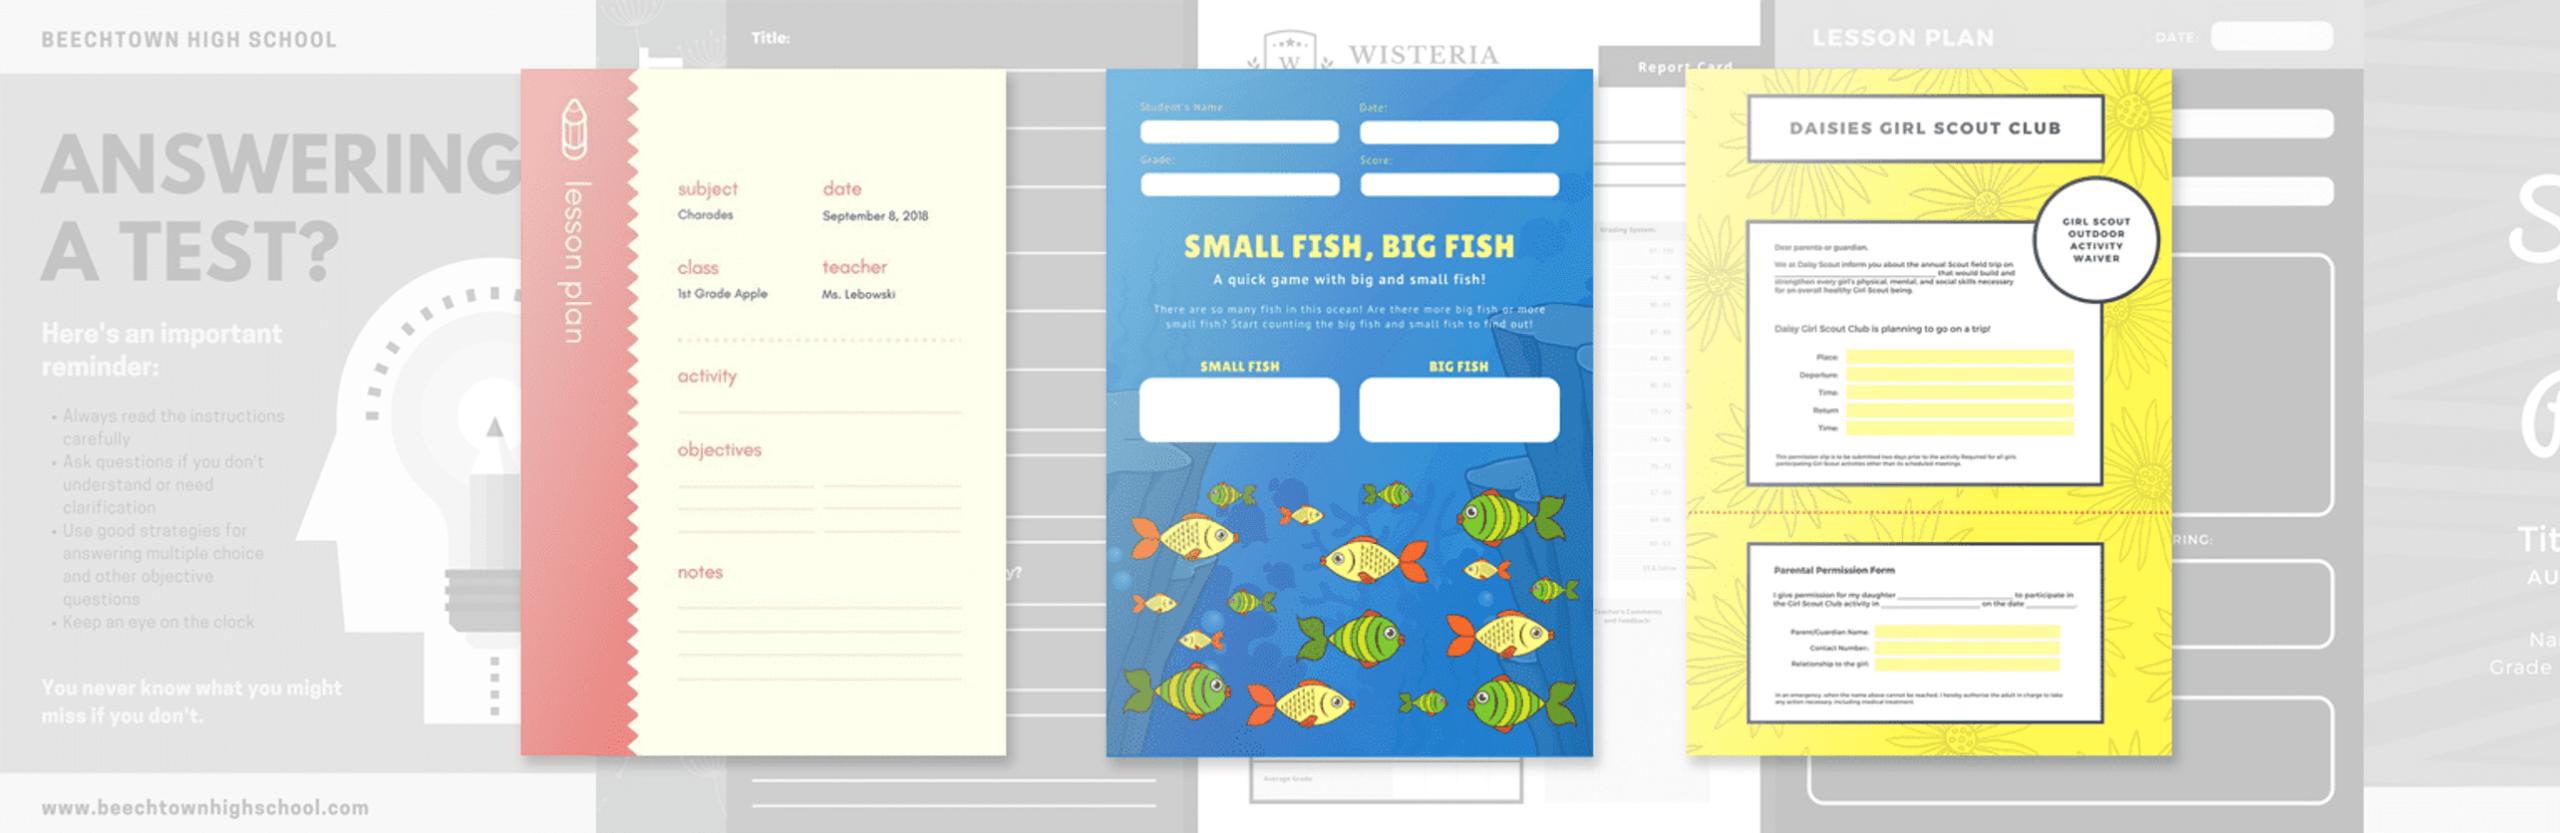 Free Online Class Schedules: Design A Custom Class Schedule within Canva Calendar Maker